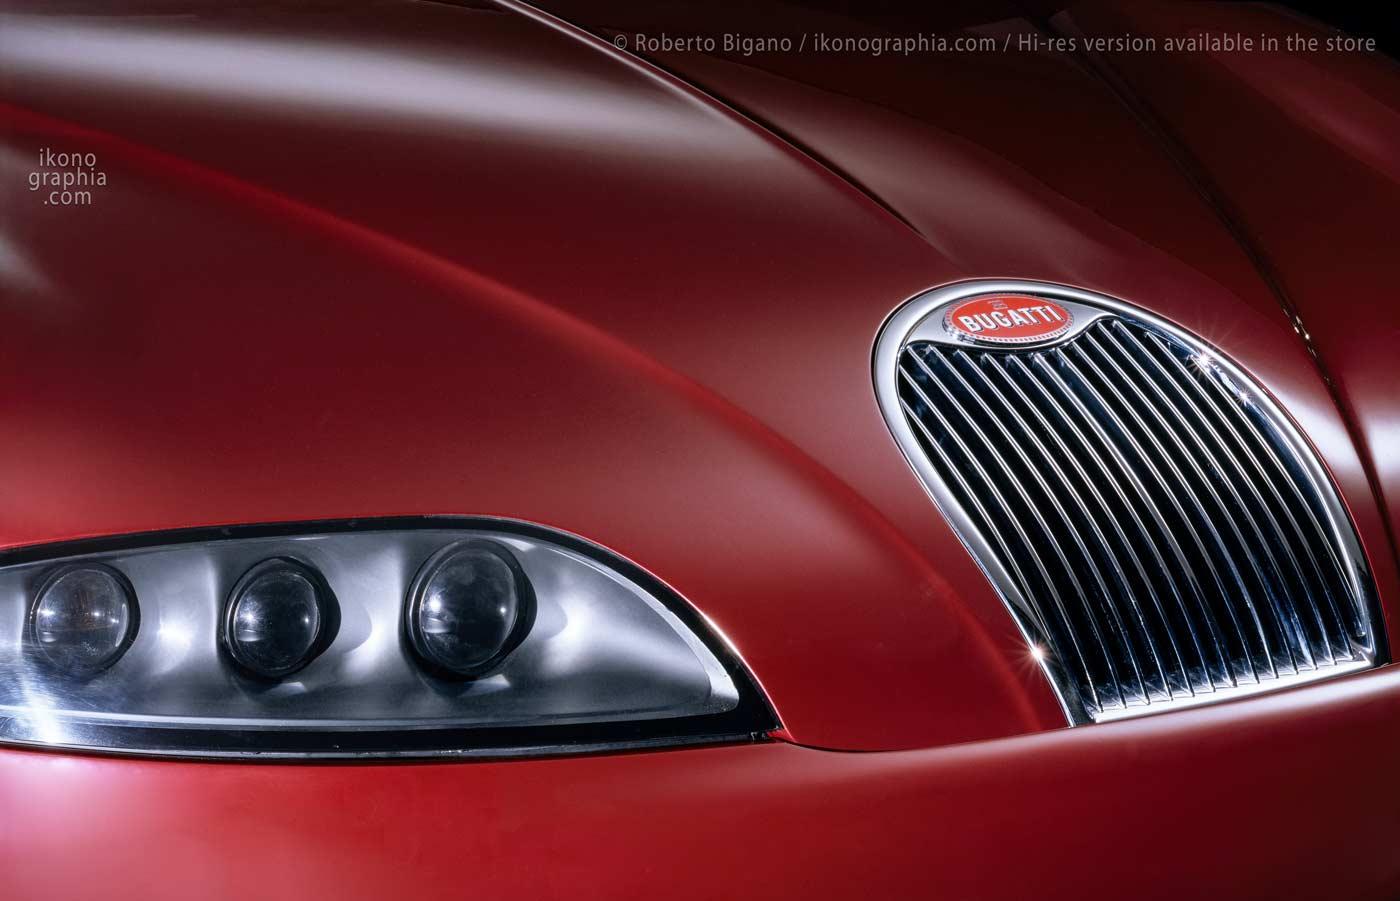 Bugatti EB 112. A detail of the striking design by Giorgietto Giugiaro with the catching radiator grill. Photo Roberto Bigano. Buy this image in the ikonographia.com store.